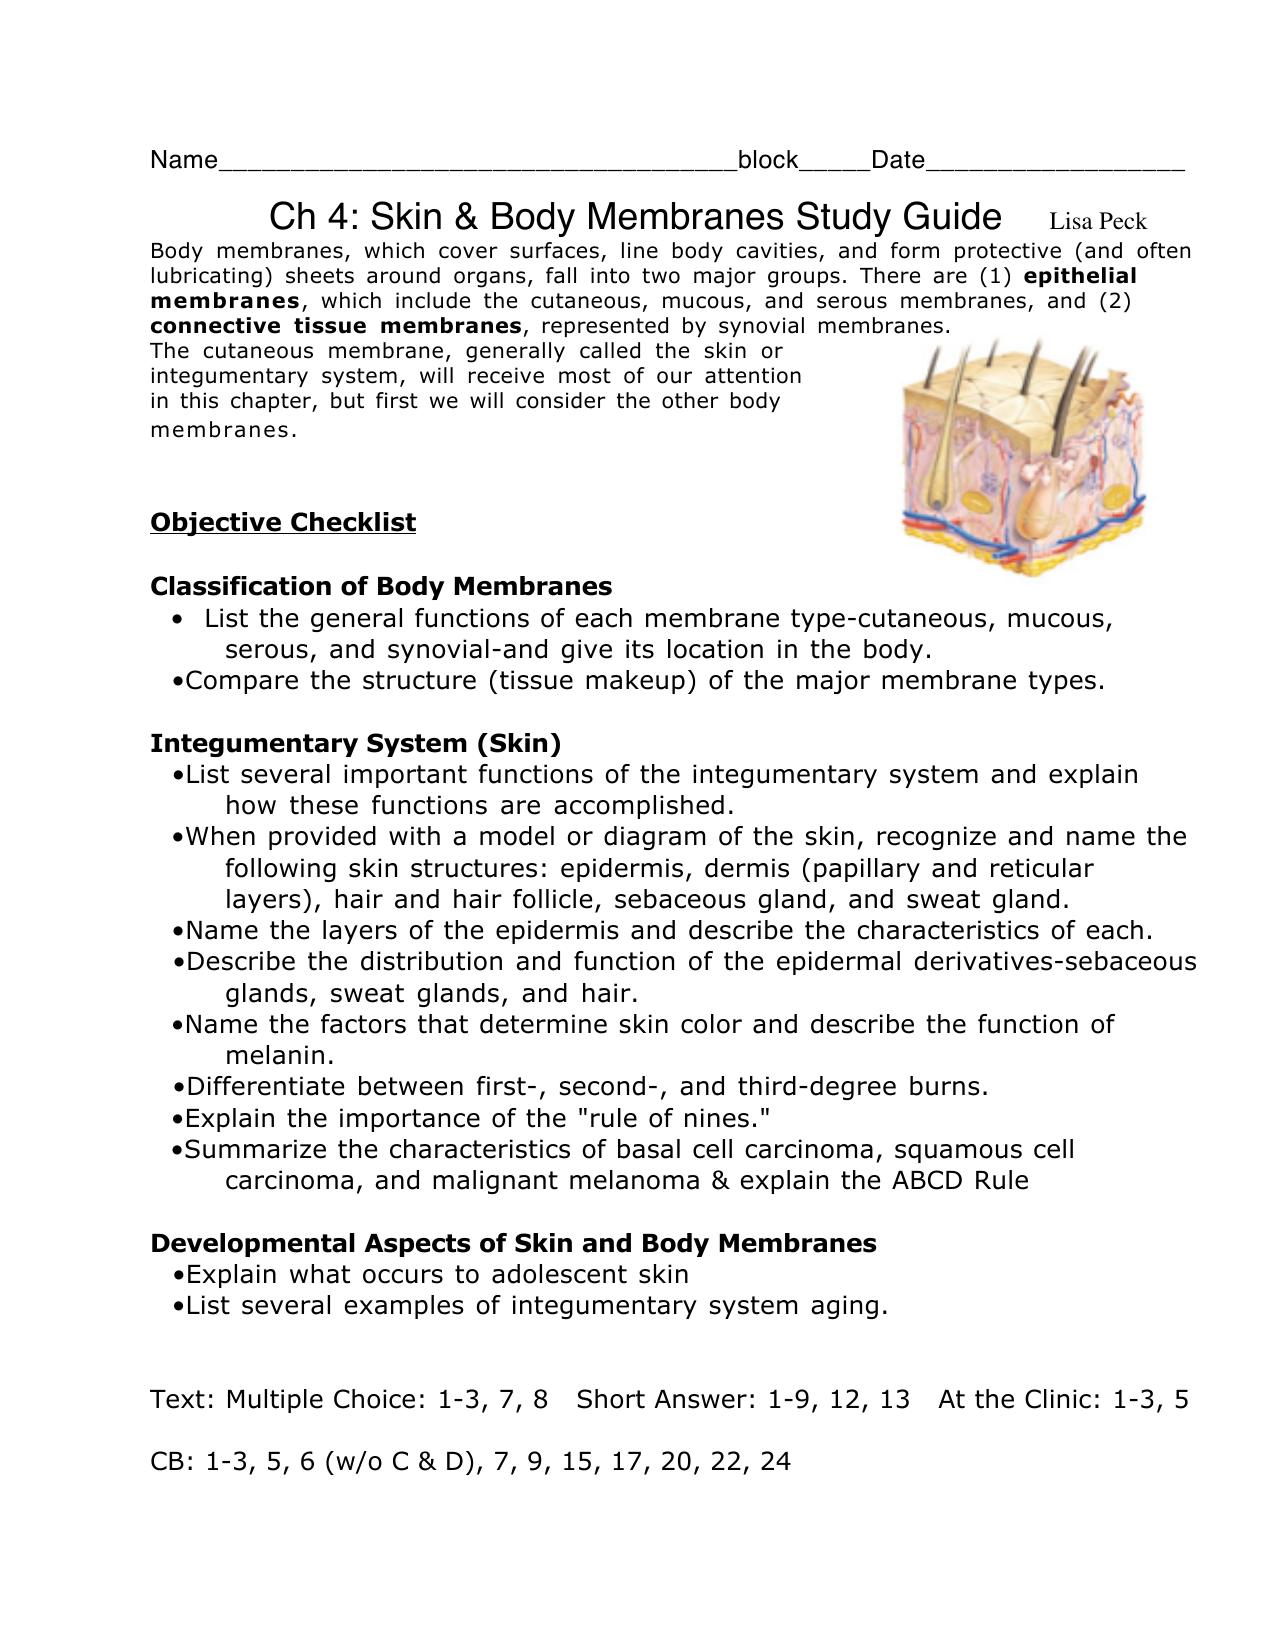 Ch 4 Skin Body Membranes Study Guide Lisa Peck